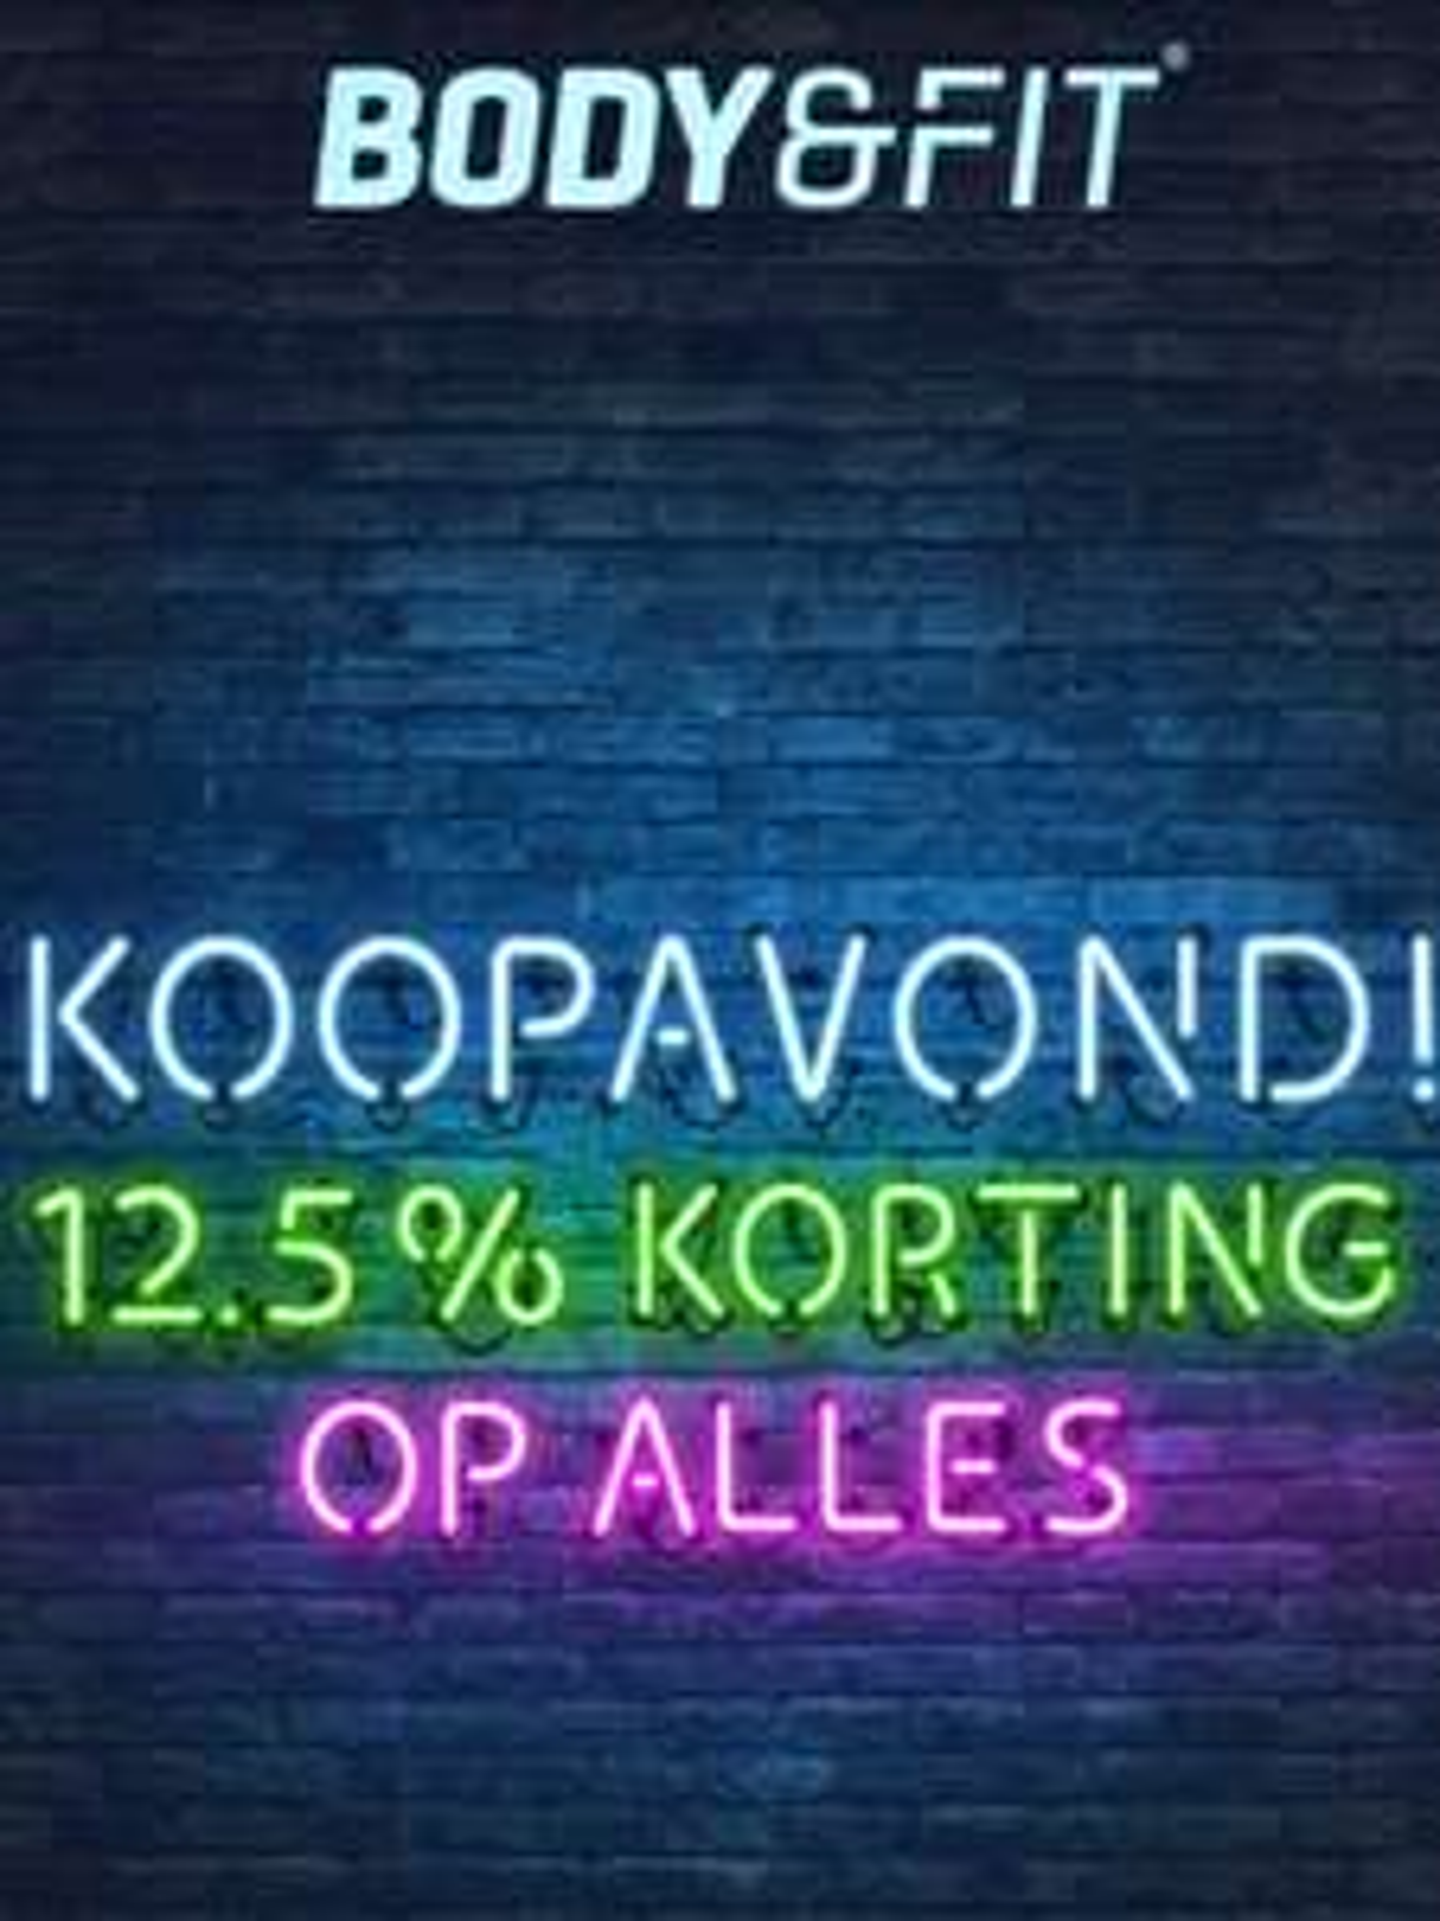 KOOPAVOND BIJ BODY&FIT - 12.5% korting